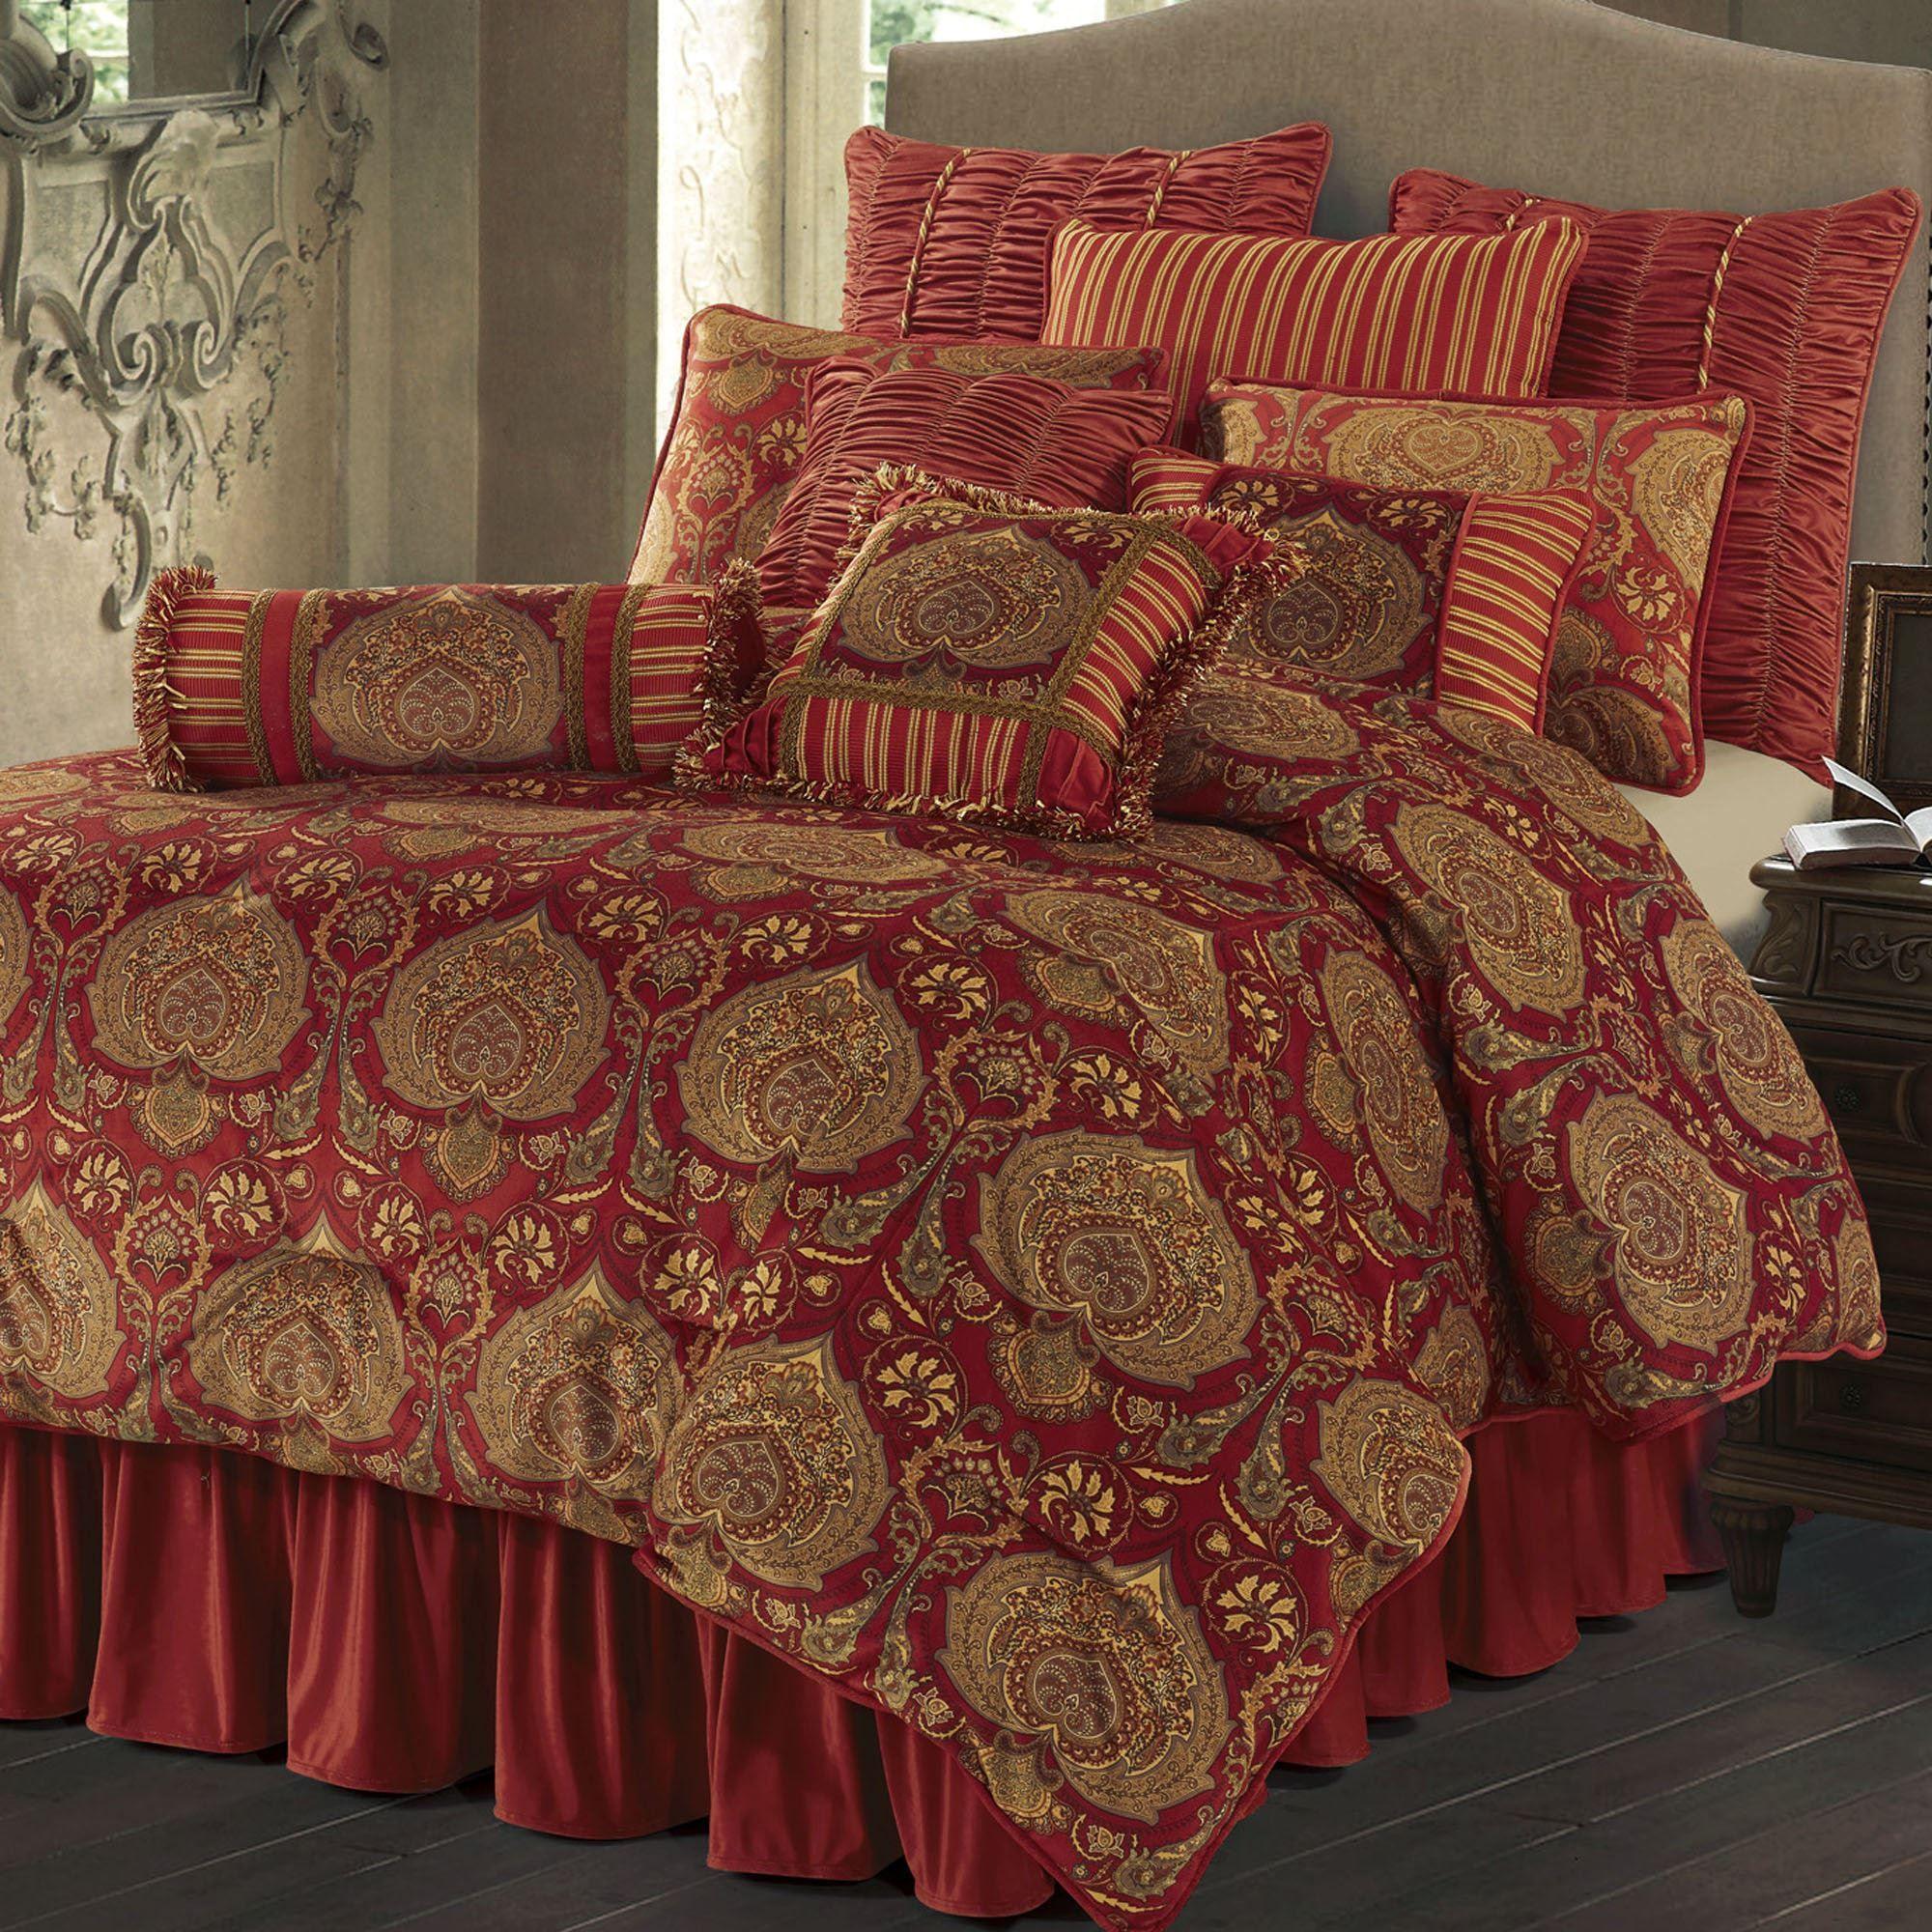 red and gold king comforter sets Lorenza Medallion Dark Red Velvet Comforter Bedding red and gold king comforter sets